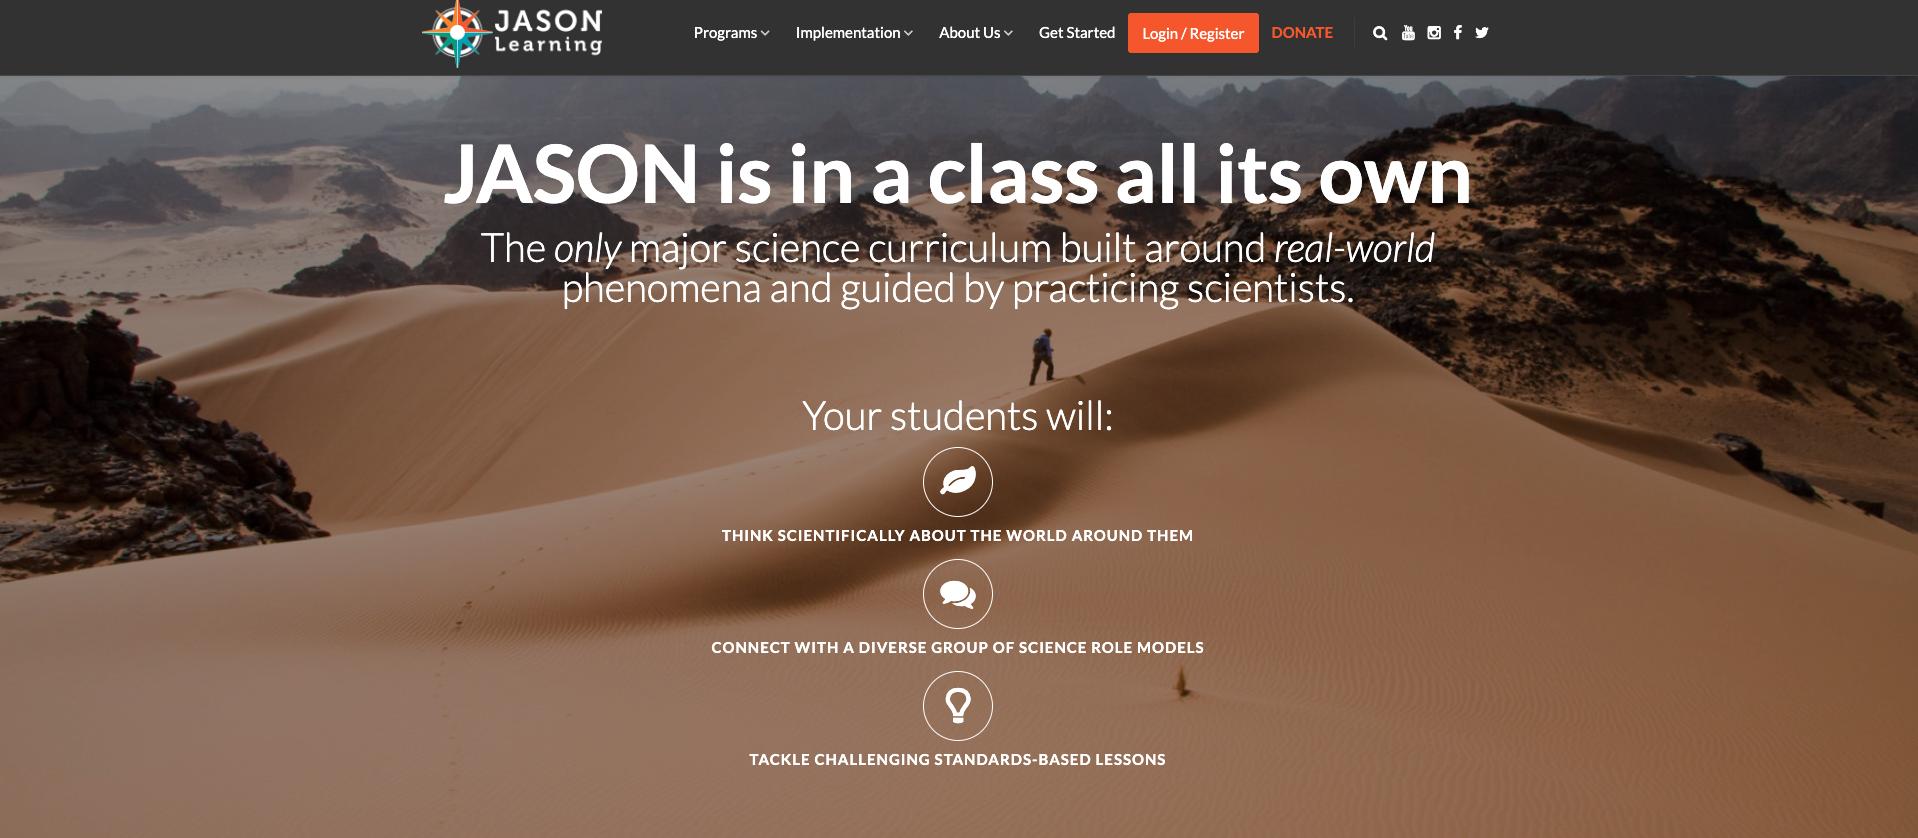 JASON Learning